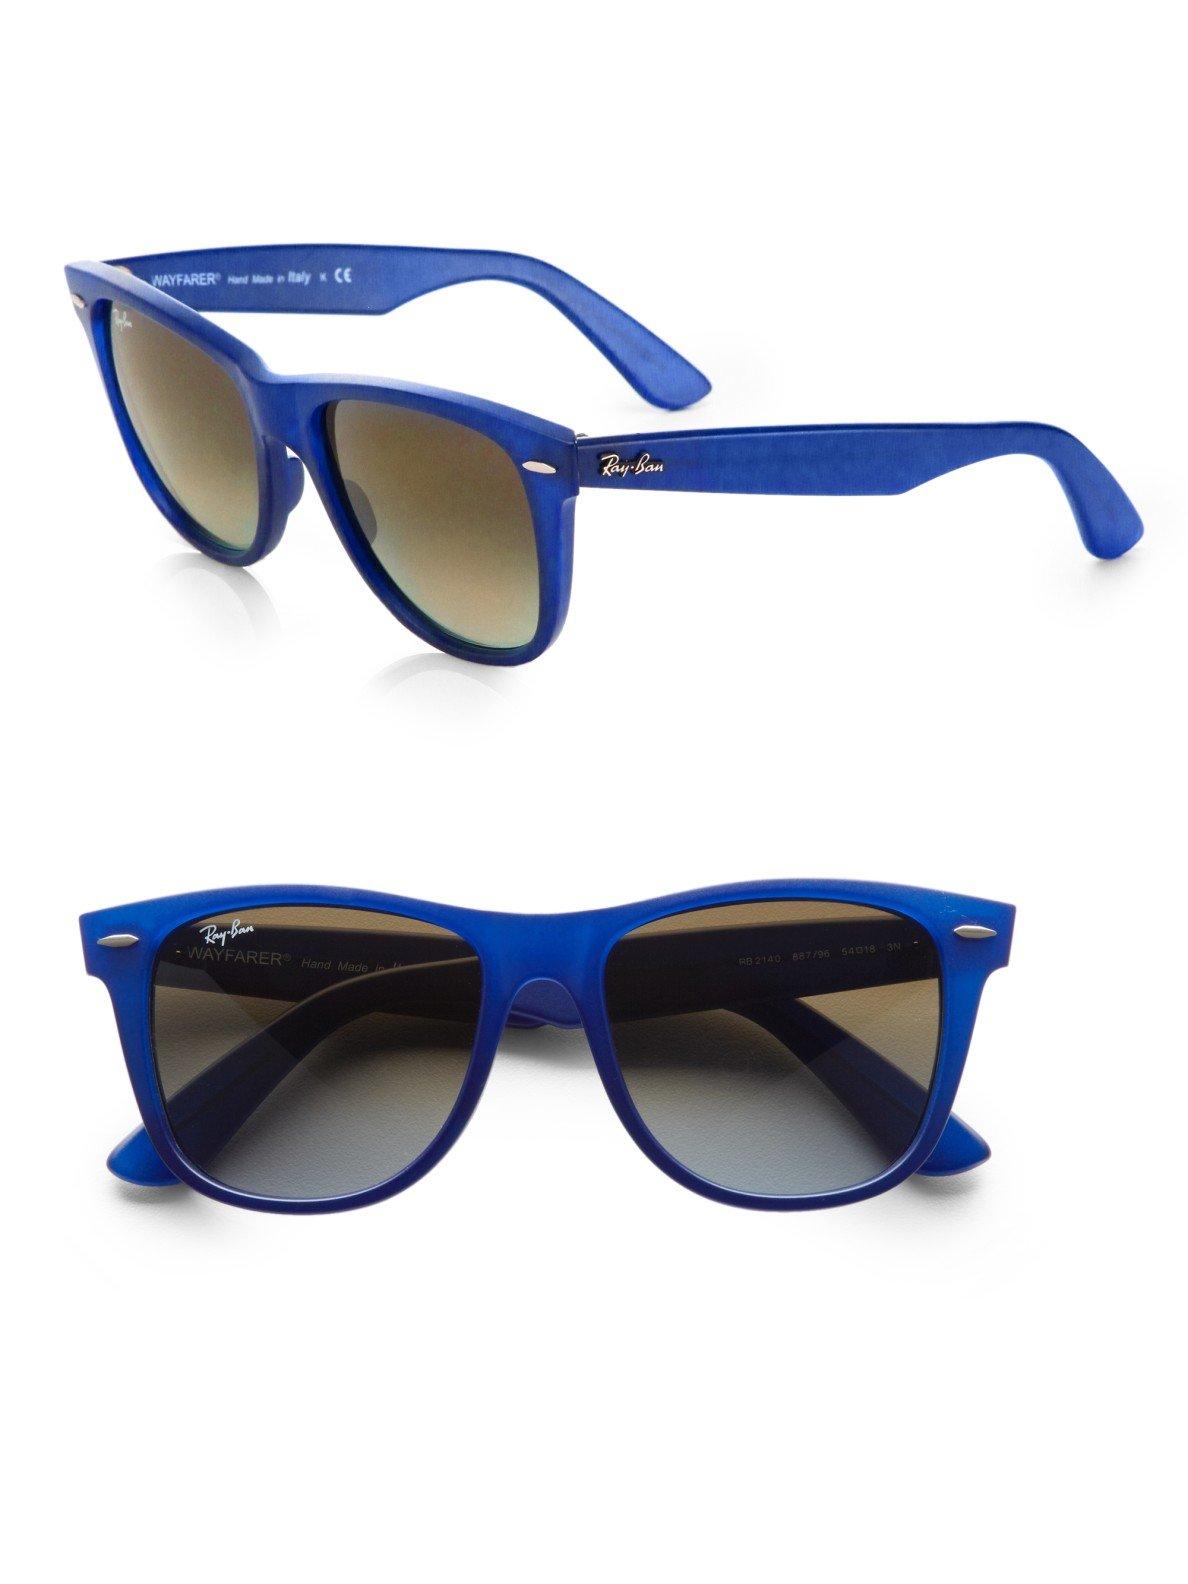 classic ray ban wayfarer sunglasses